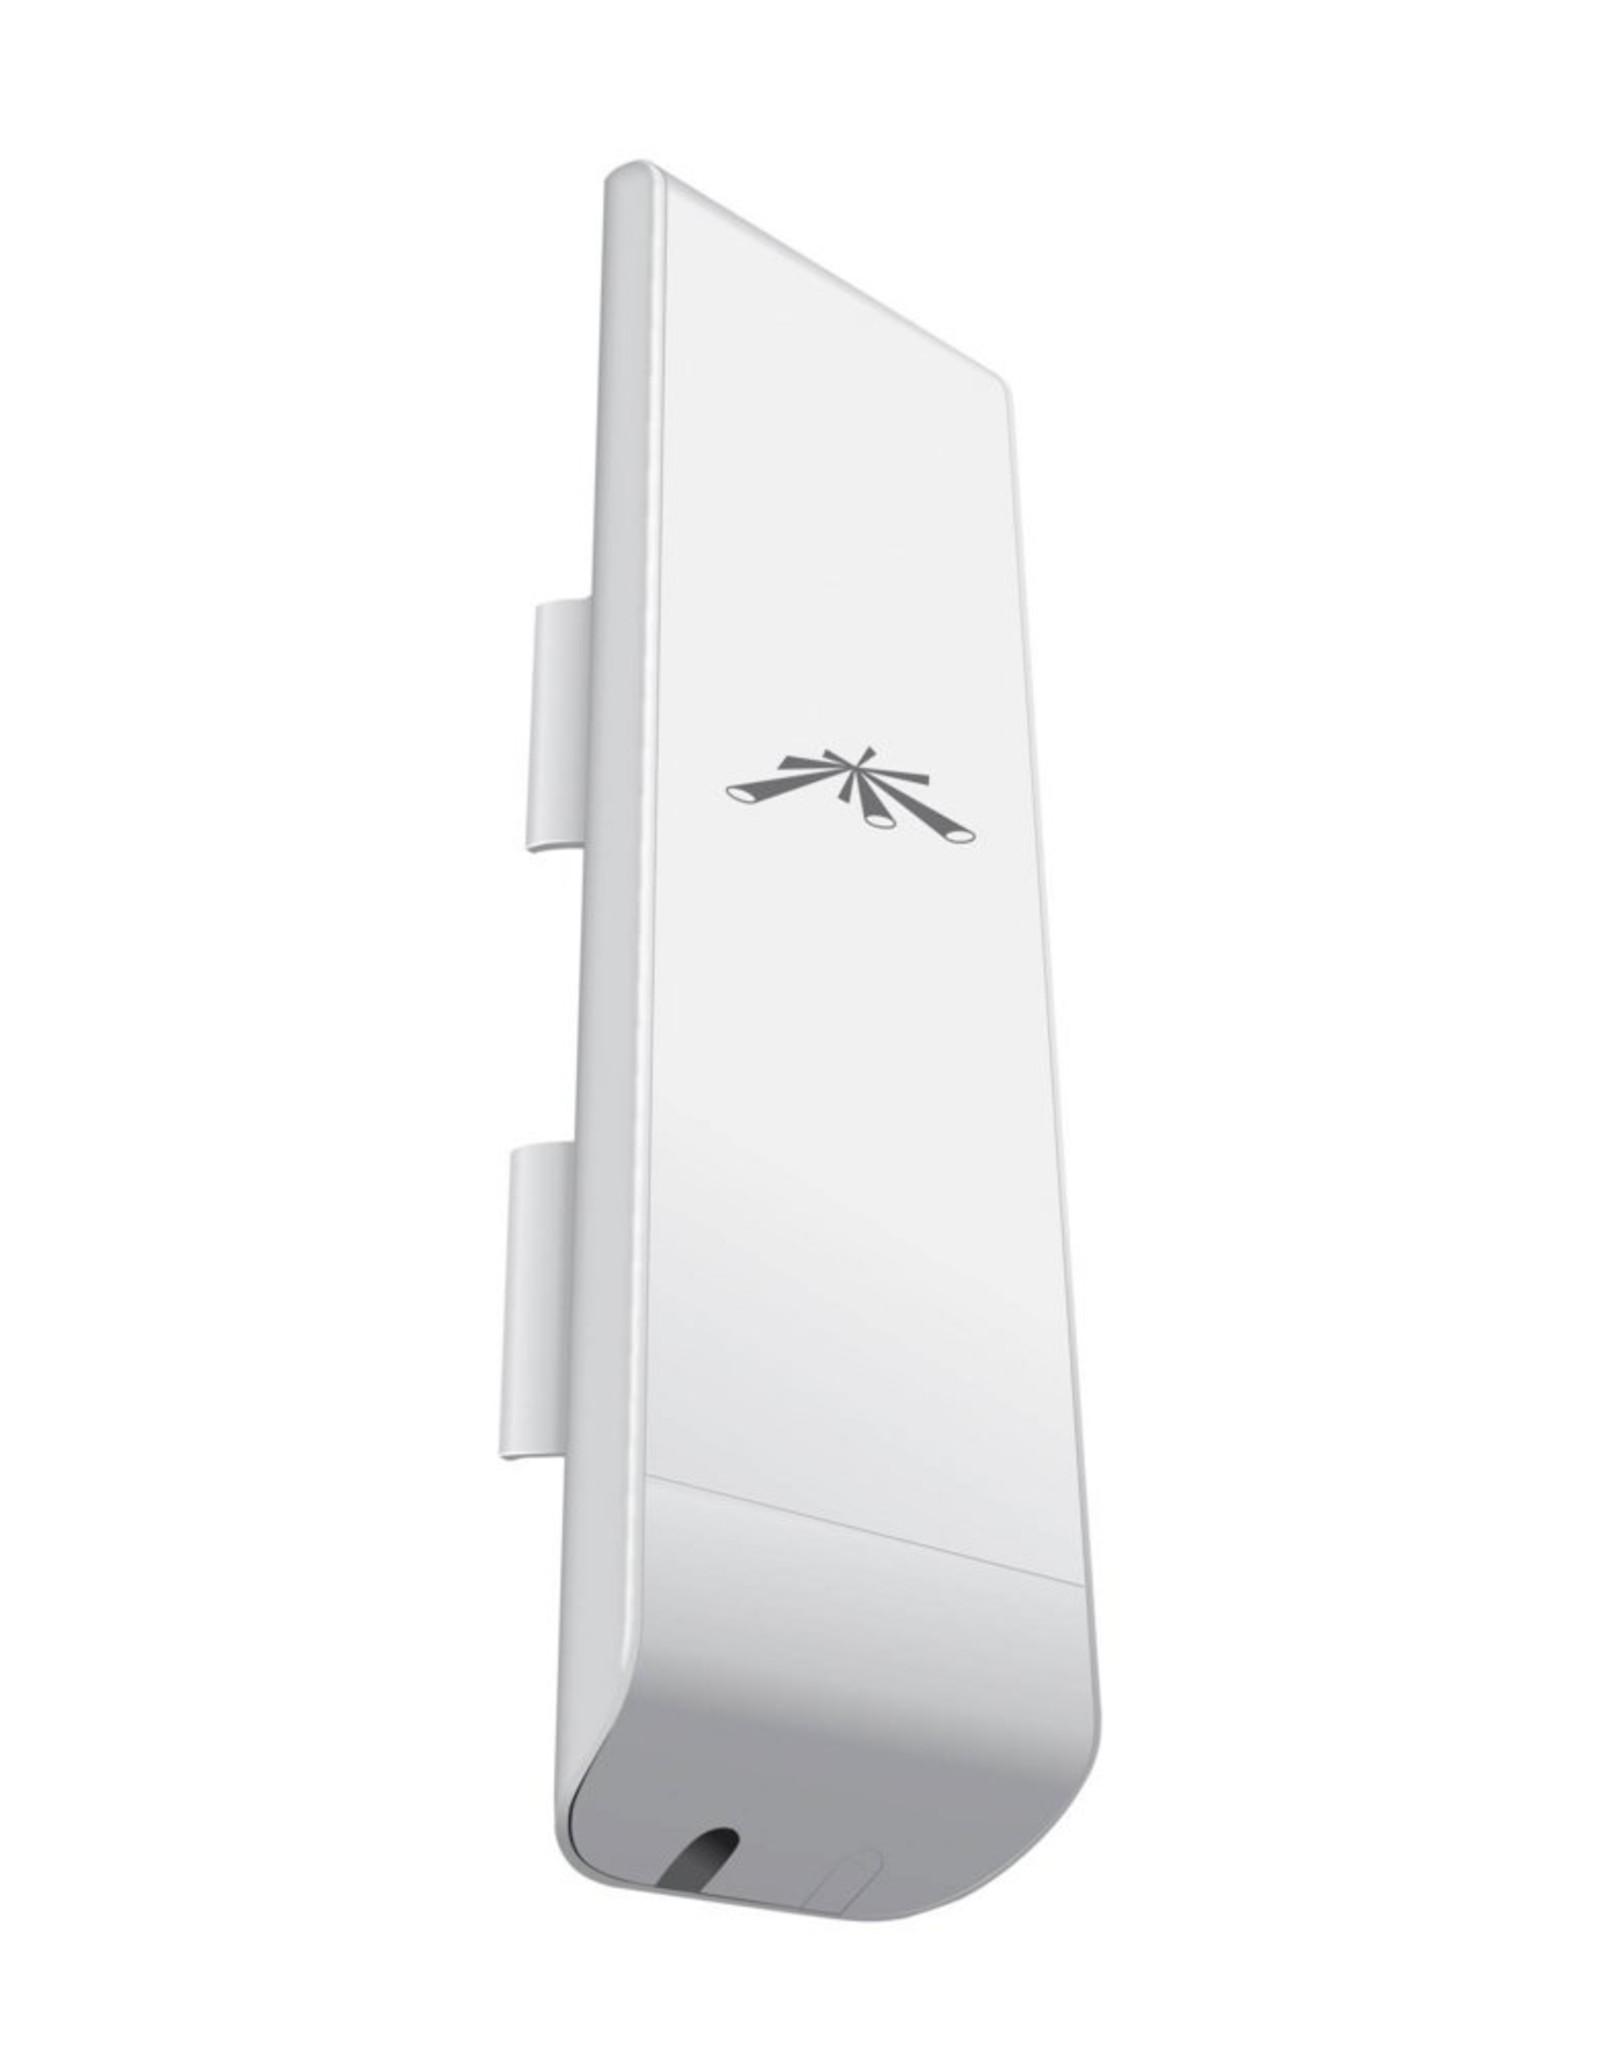 airMAX NanoStation M5 5GHz/16dBi/150+ Mbps